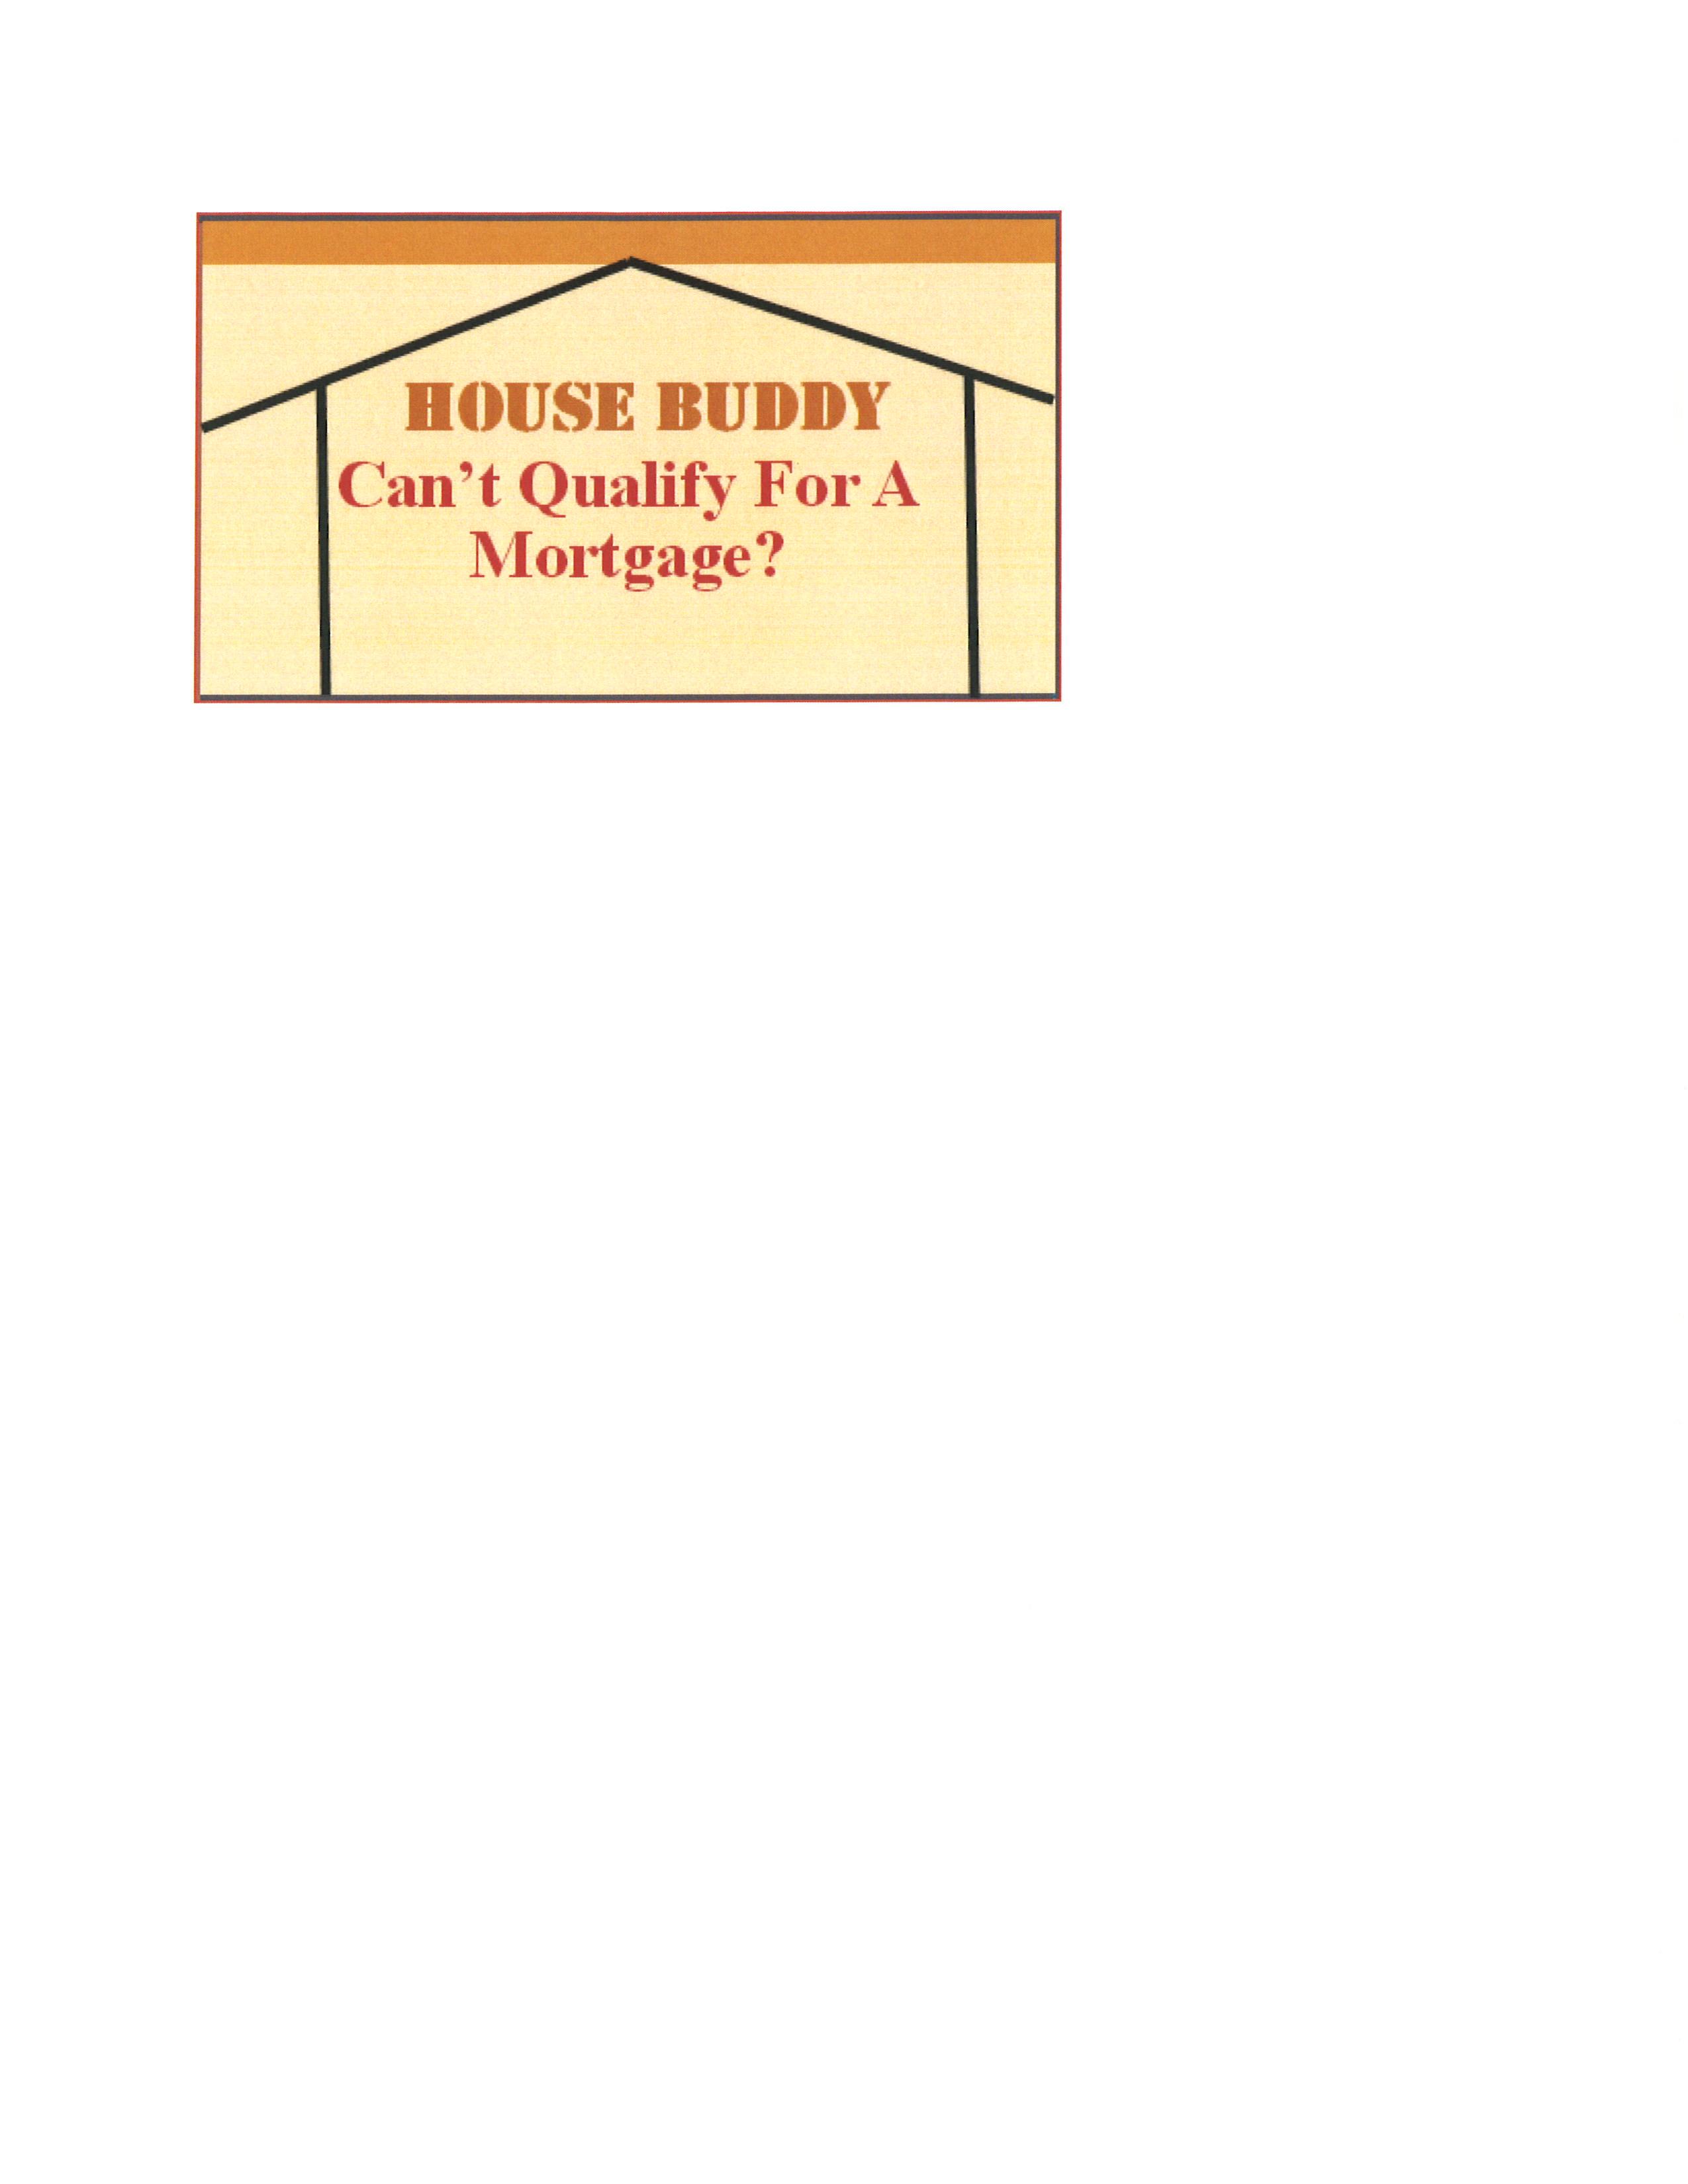 HOUSE BUDDY REVISED With Drawn Image around it .jpg